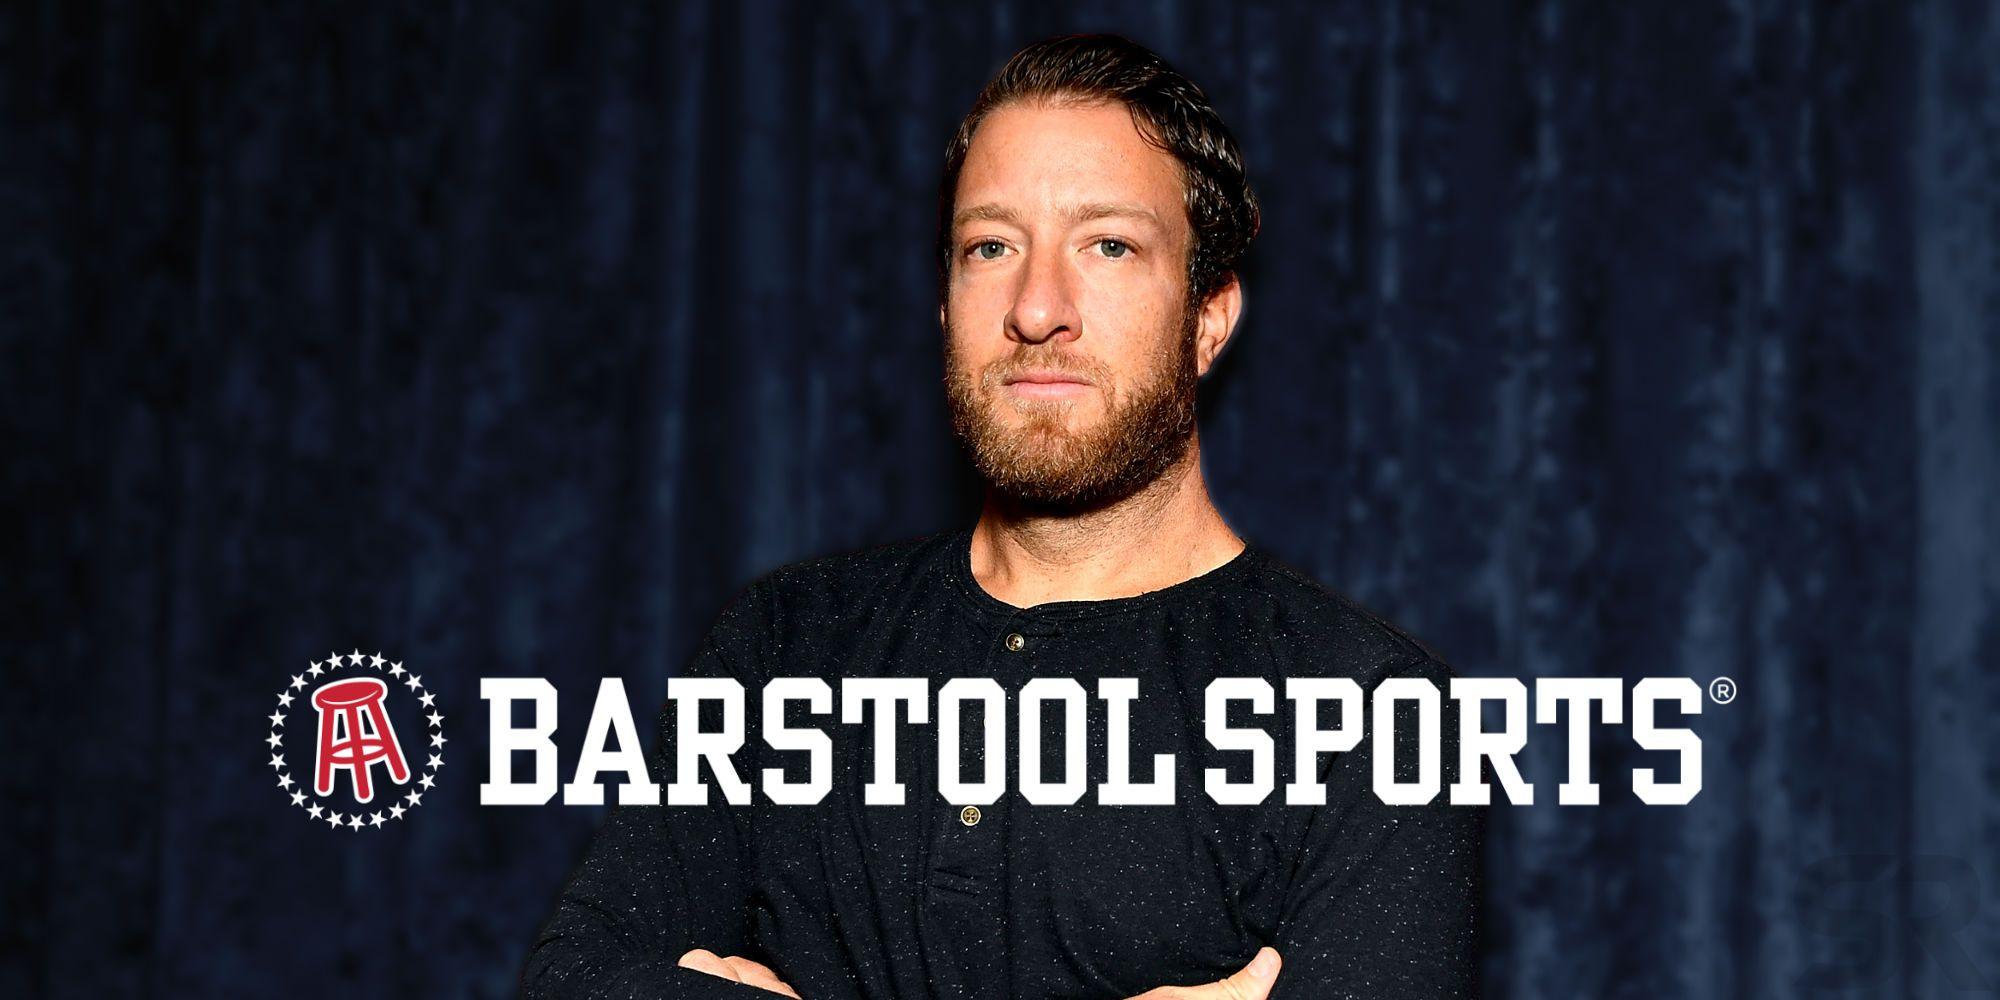 TV and Movie News Barstool Sports Founder's Anti-Union